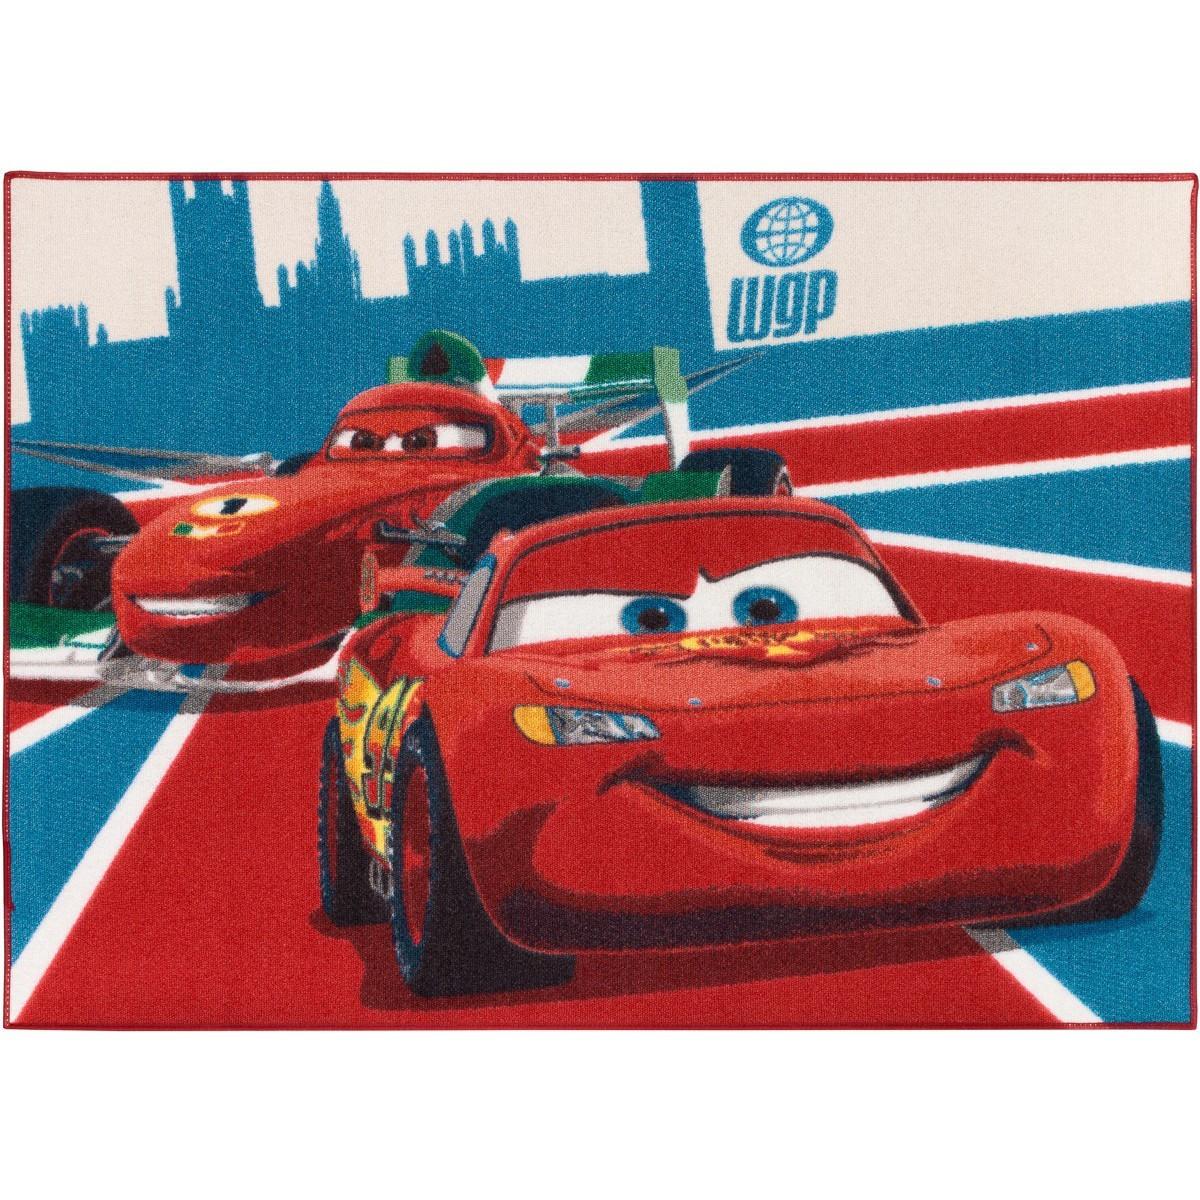 Kinderteppich cars 2 mcqueen francesco teppich 95x133 cm for Raumgestaltung mcqueen